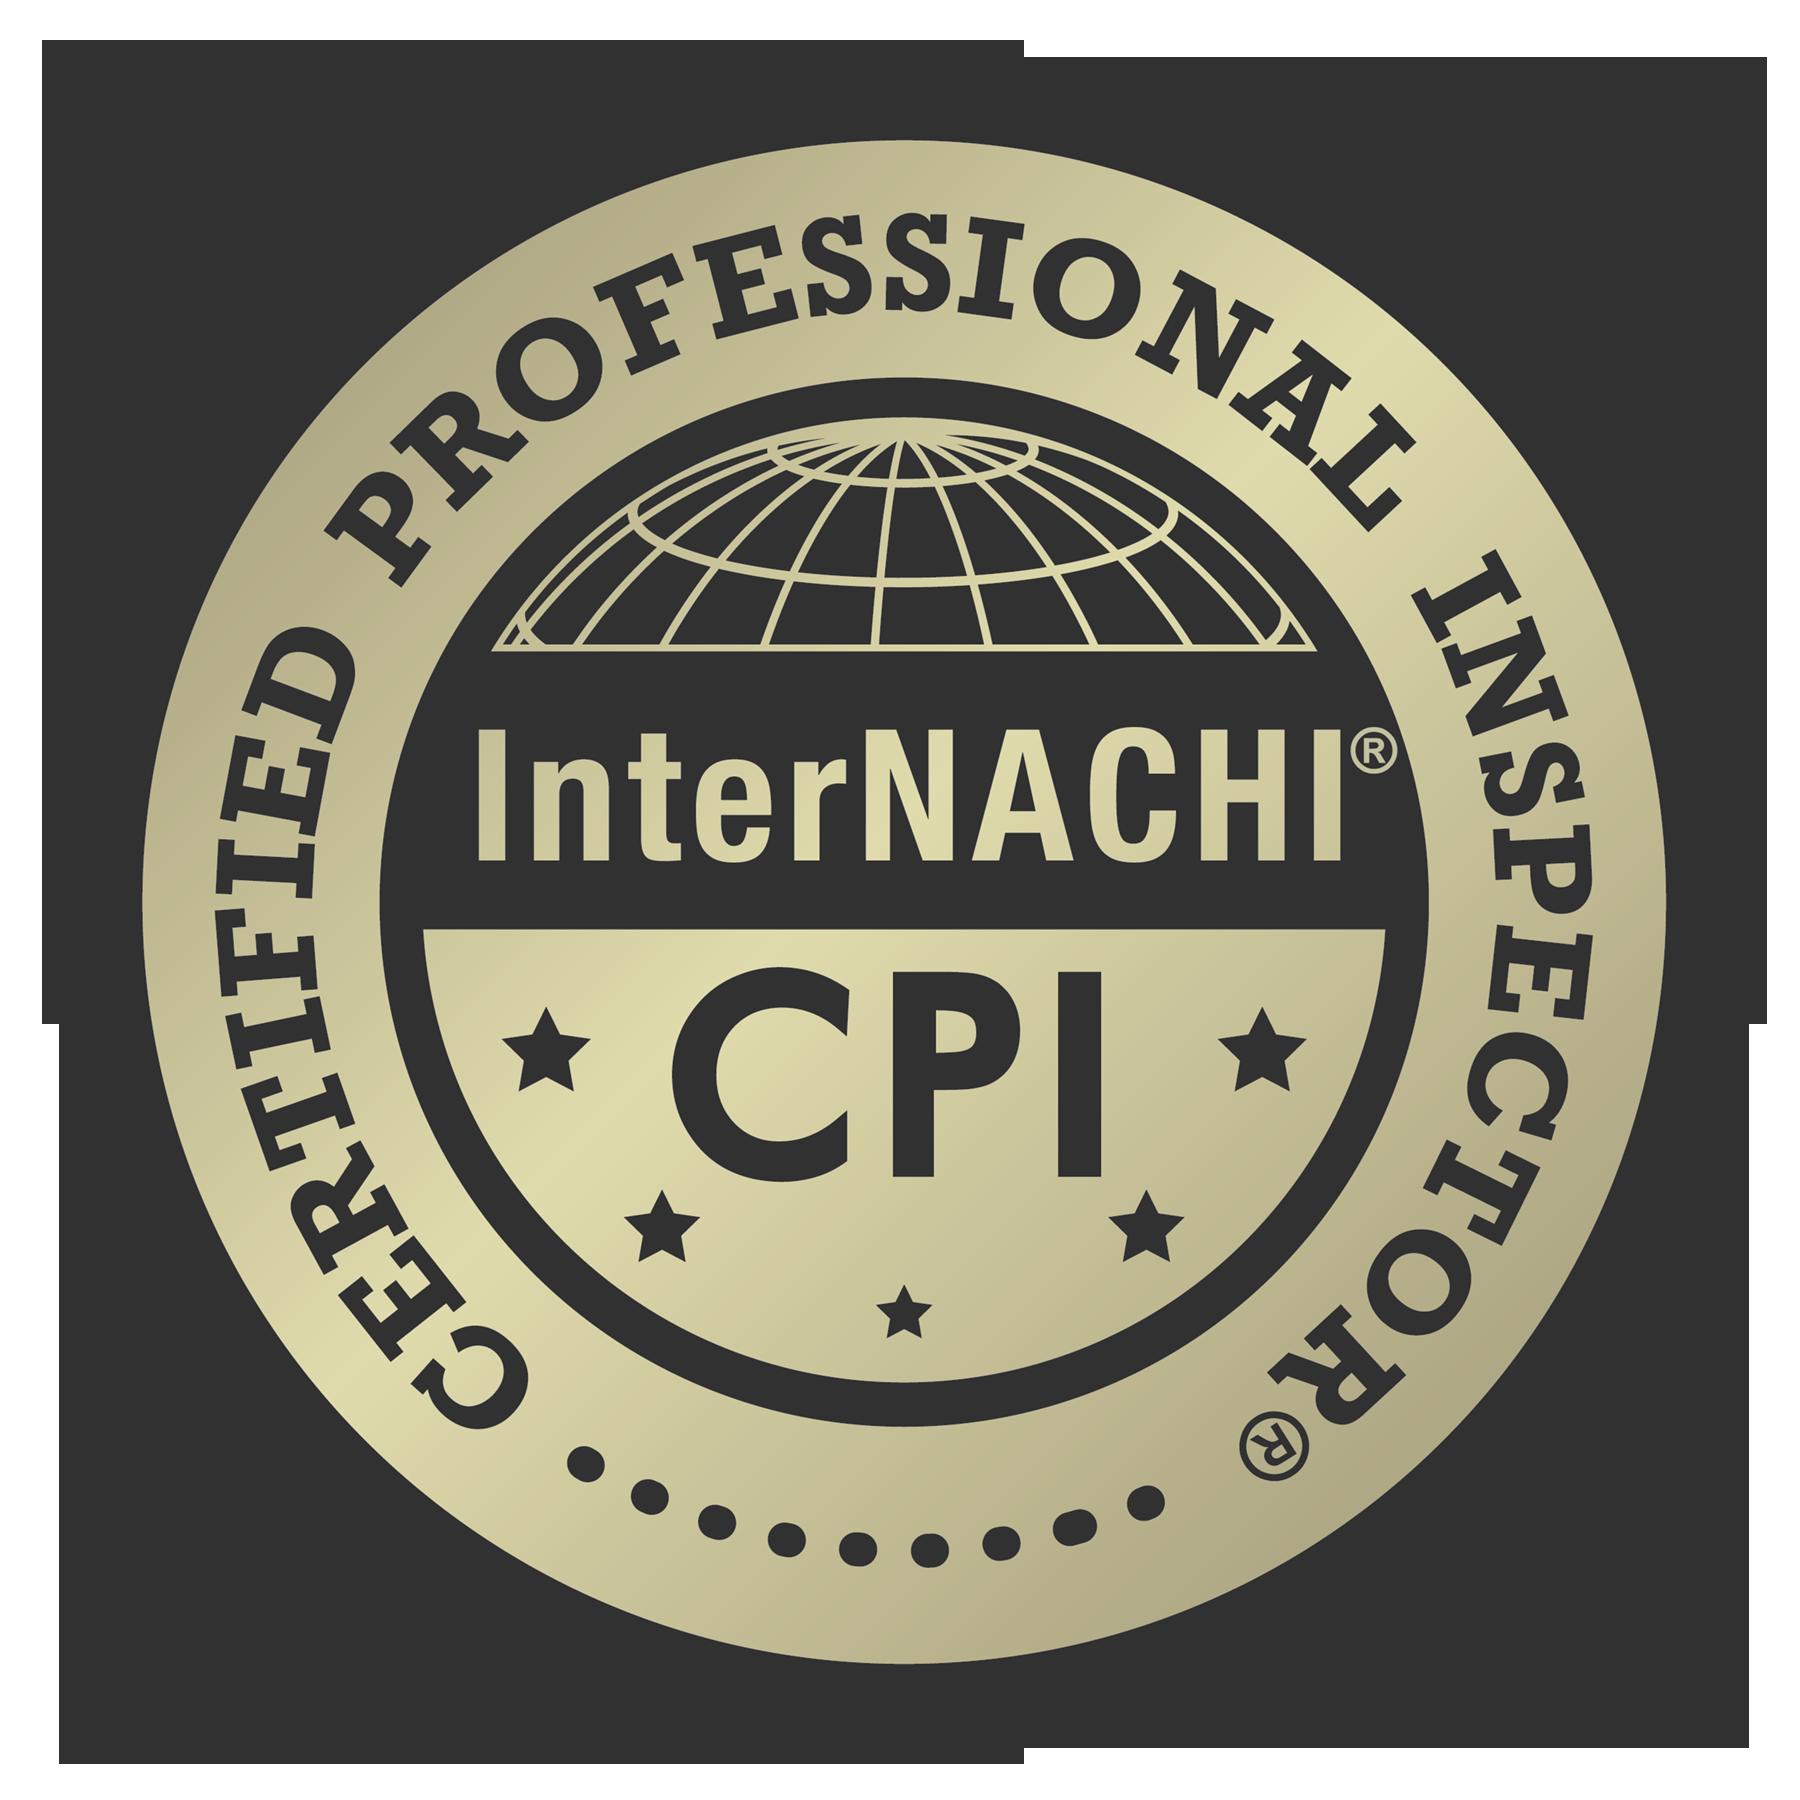 InterNACHI Certified Professional Inspector in Halifax Nova Scotia